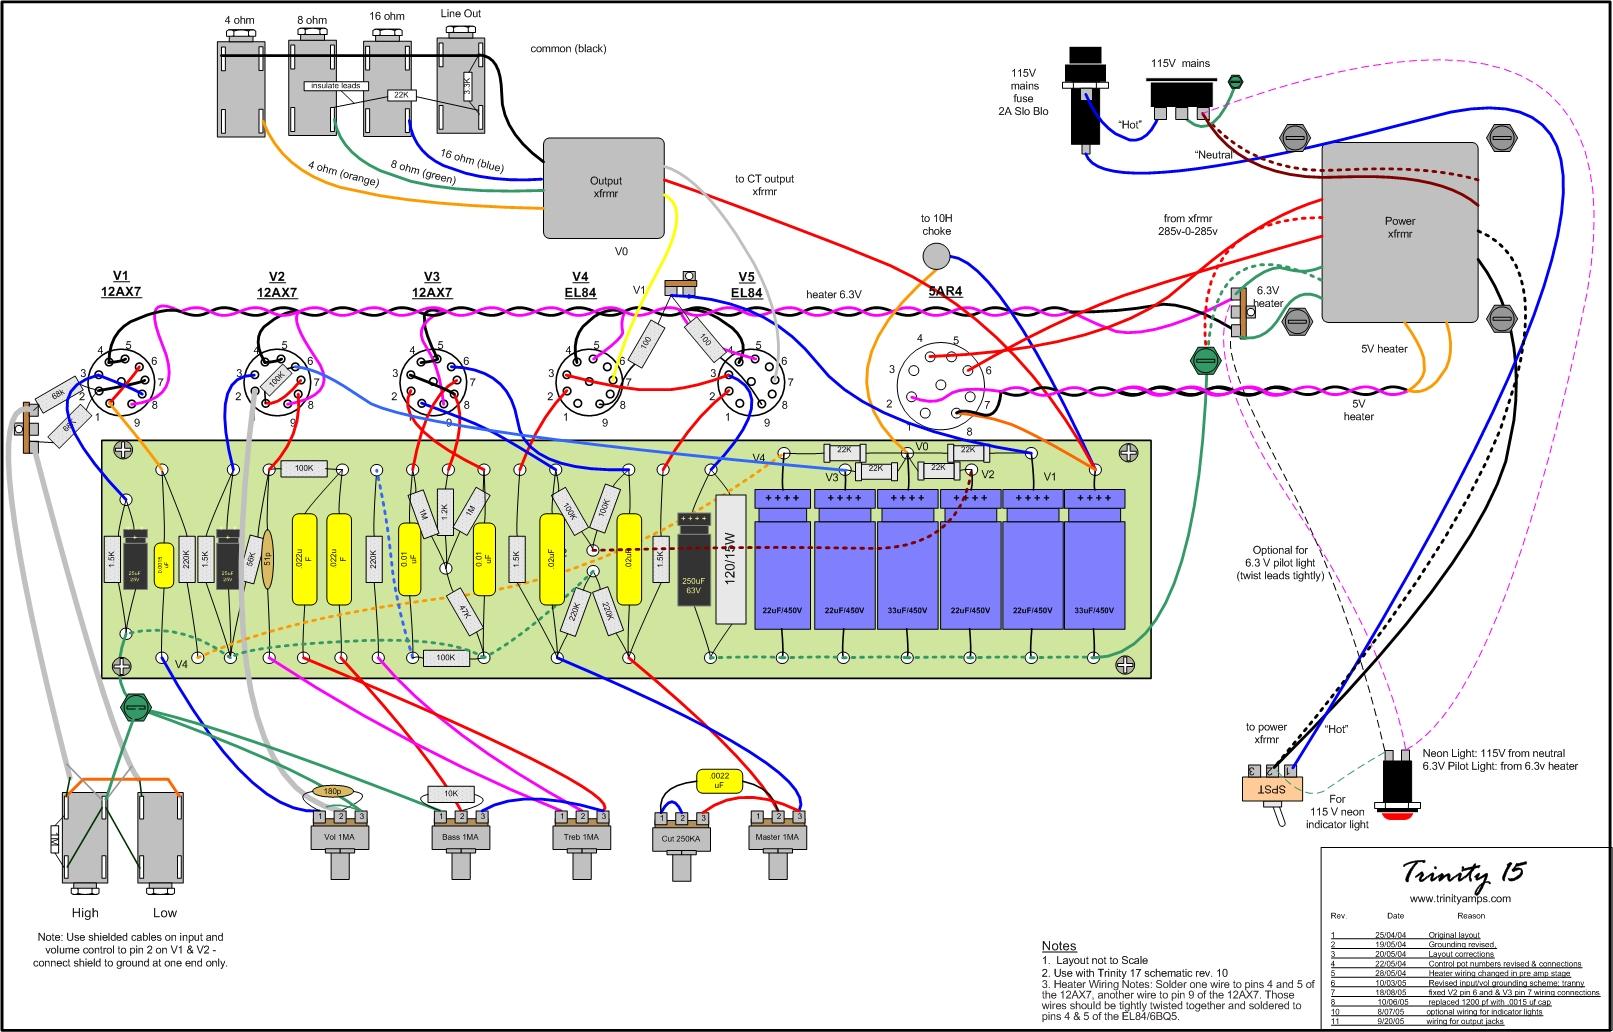 Index Of Forumgallery Trinity 5wtubeamplifiercircuitwithel84gif 18 Oct 2007